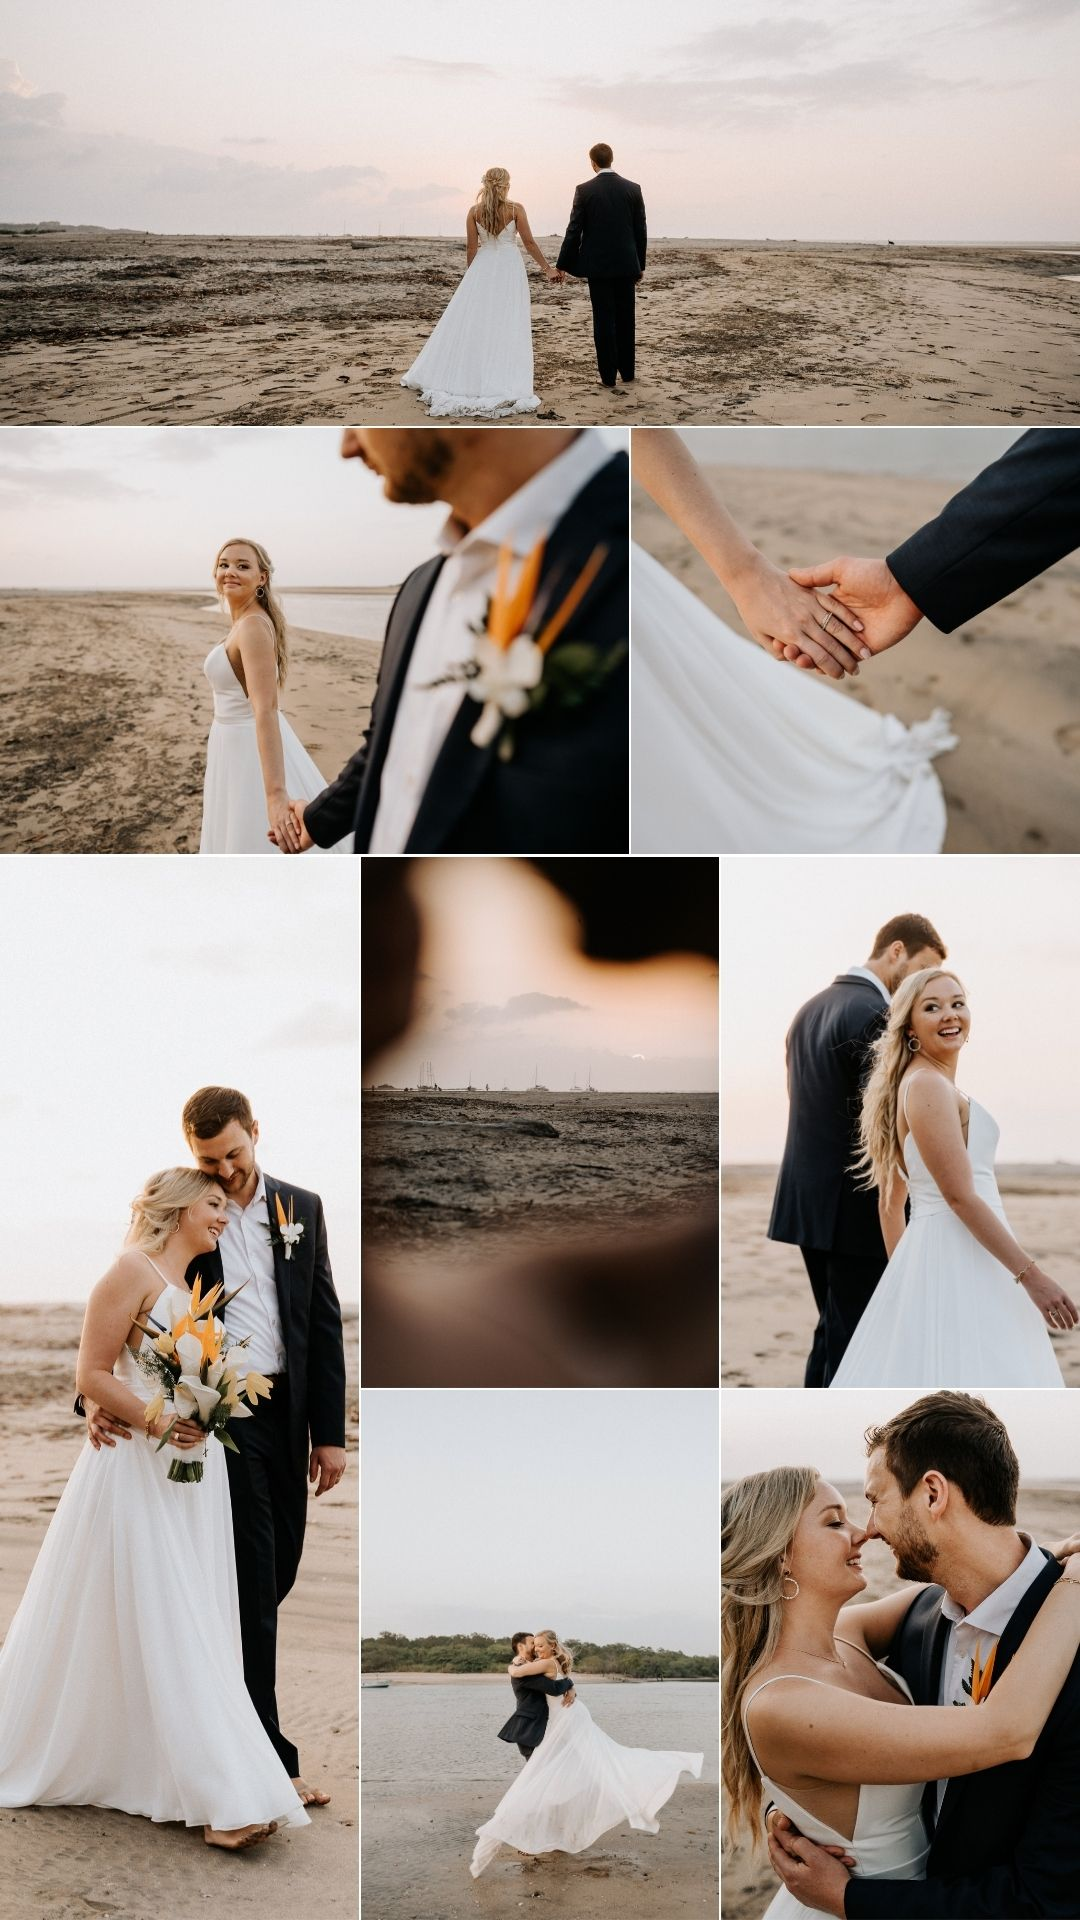 playa tamarindo costa rica photoshoot bride and groom